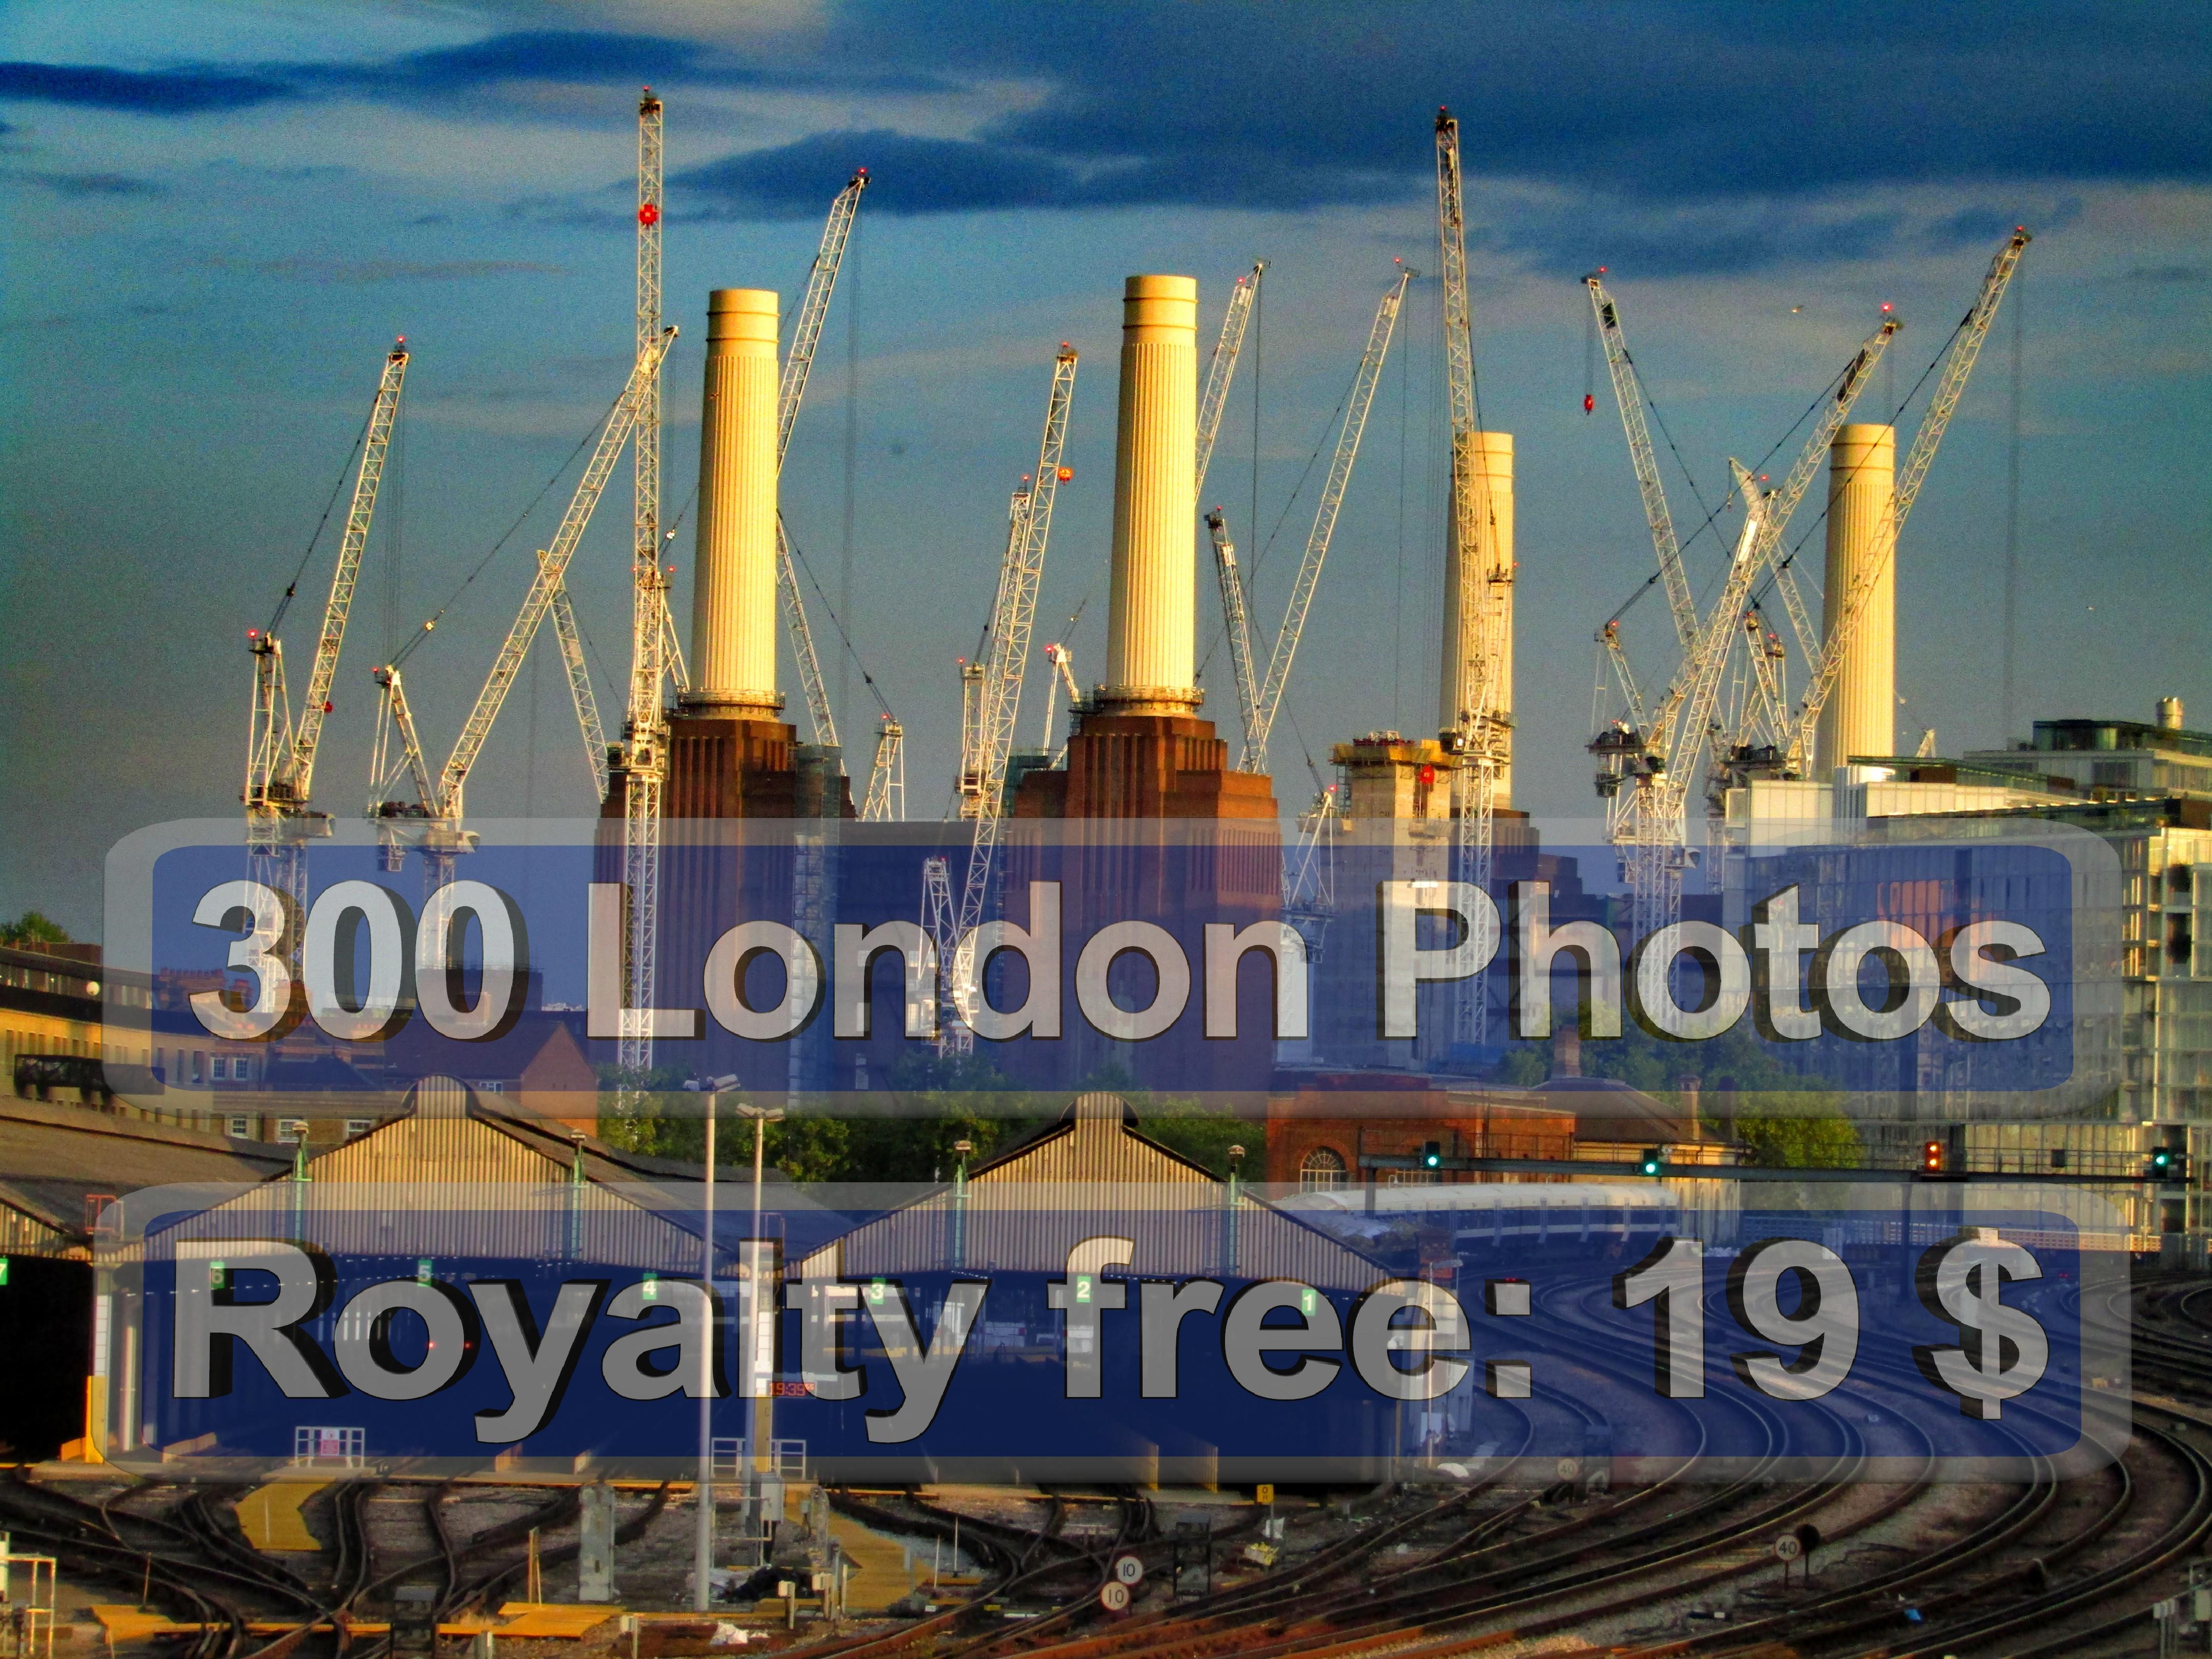 London Drugs Photo Quadra